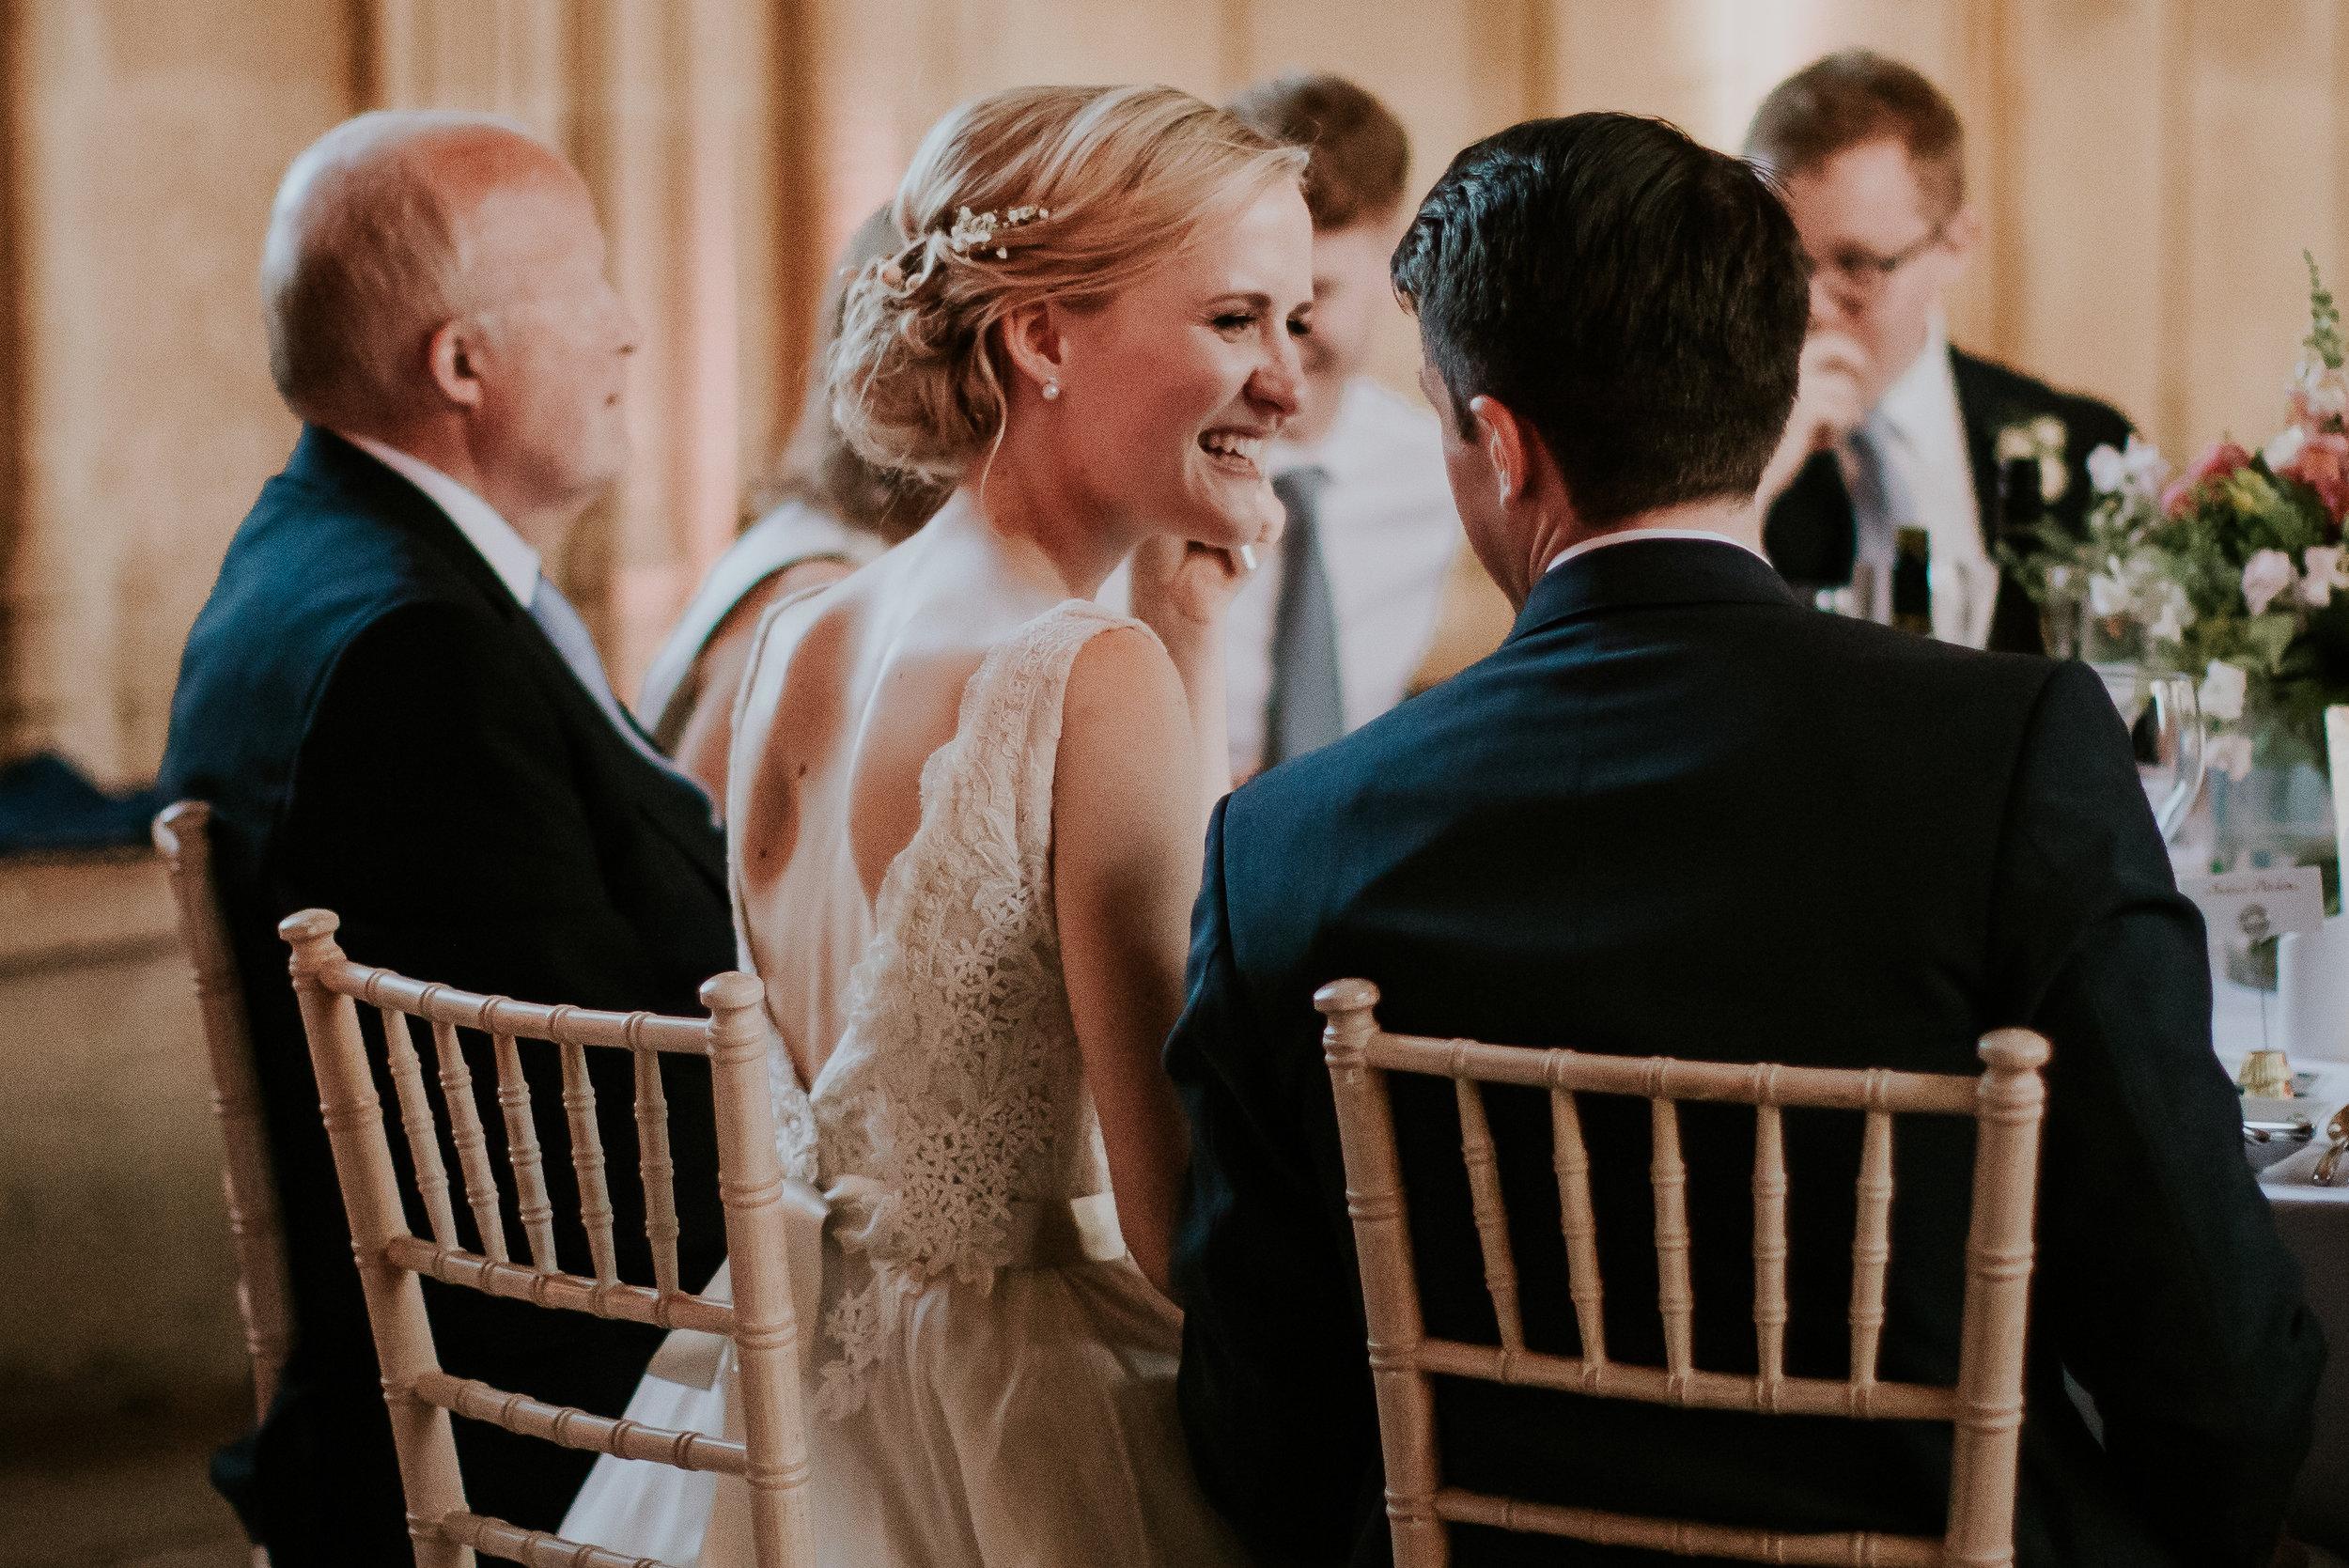 sam-andrew-wedding-pembroke-bodleian-kelechianna-304.jpg